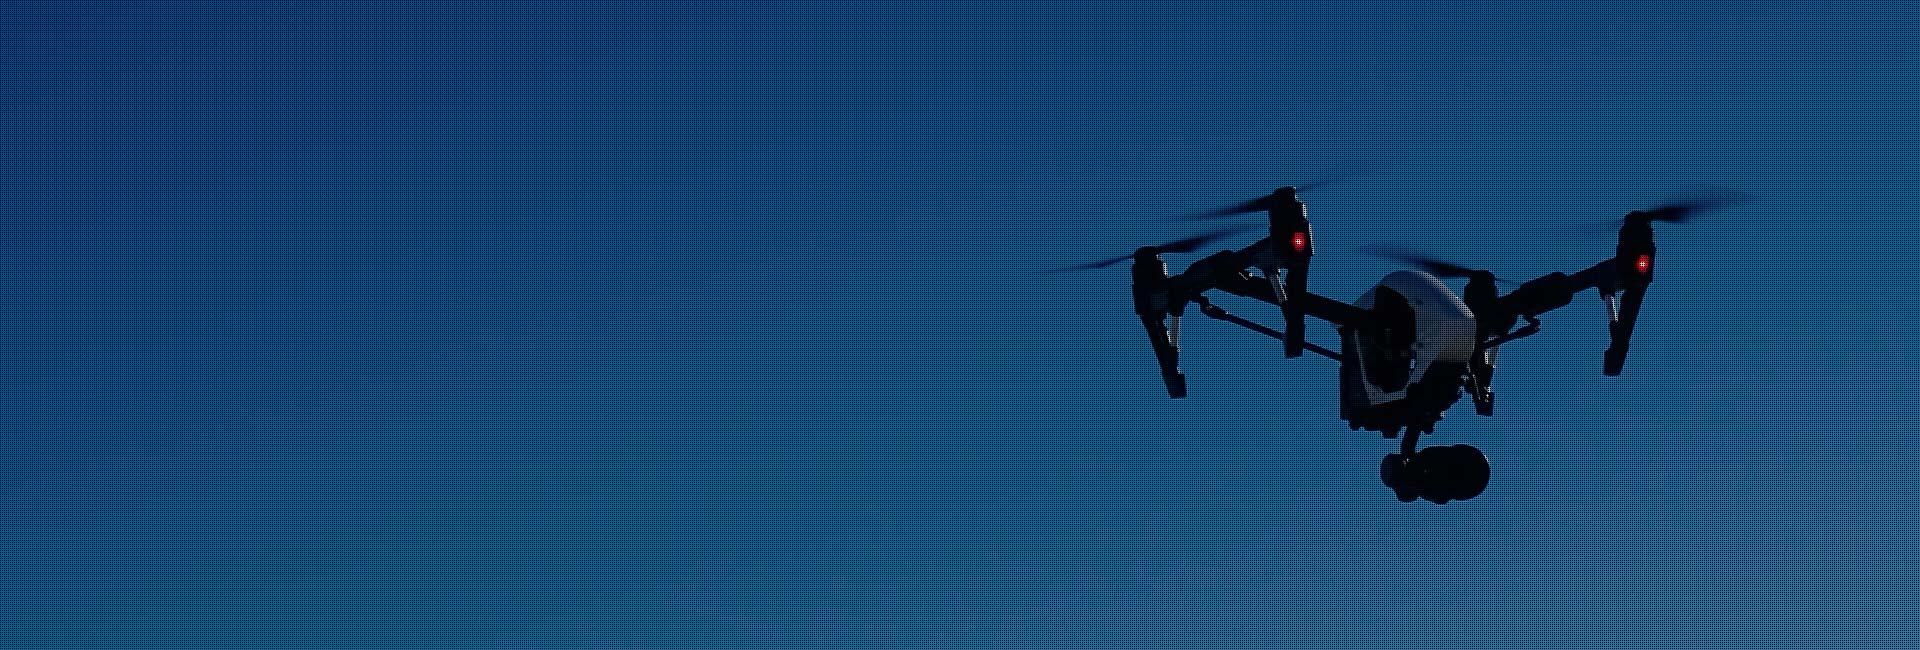 infopymemurcia-home-slide-drones